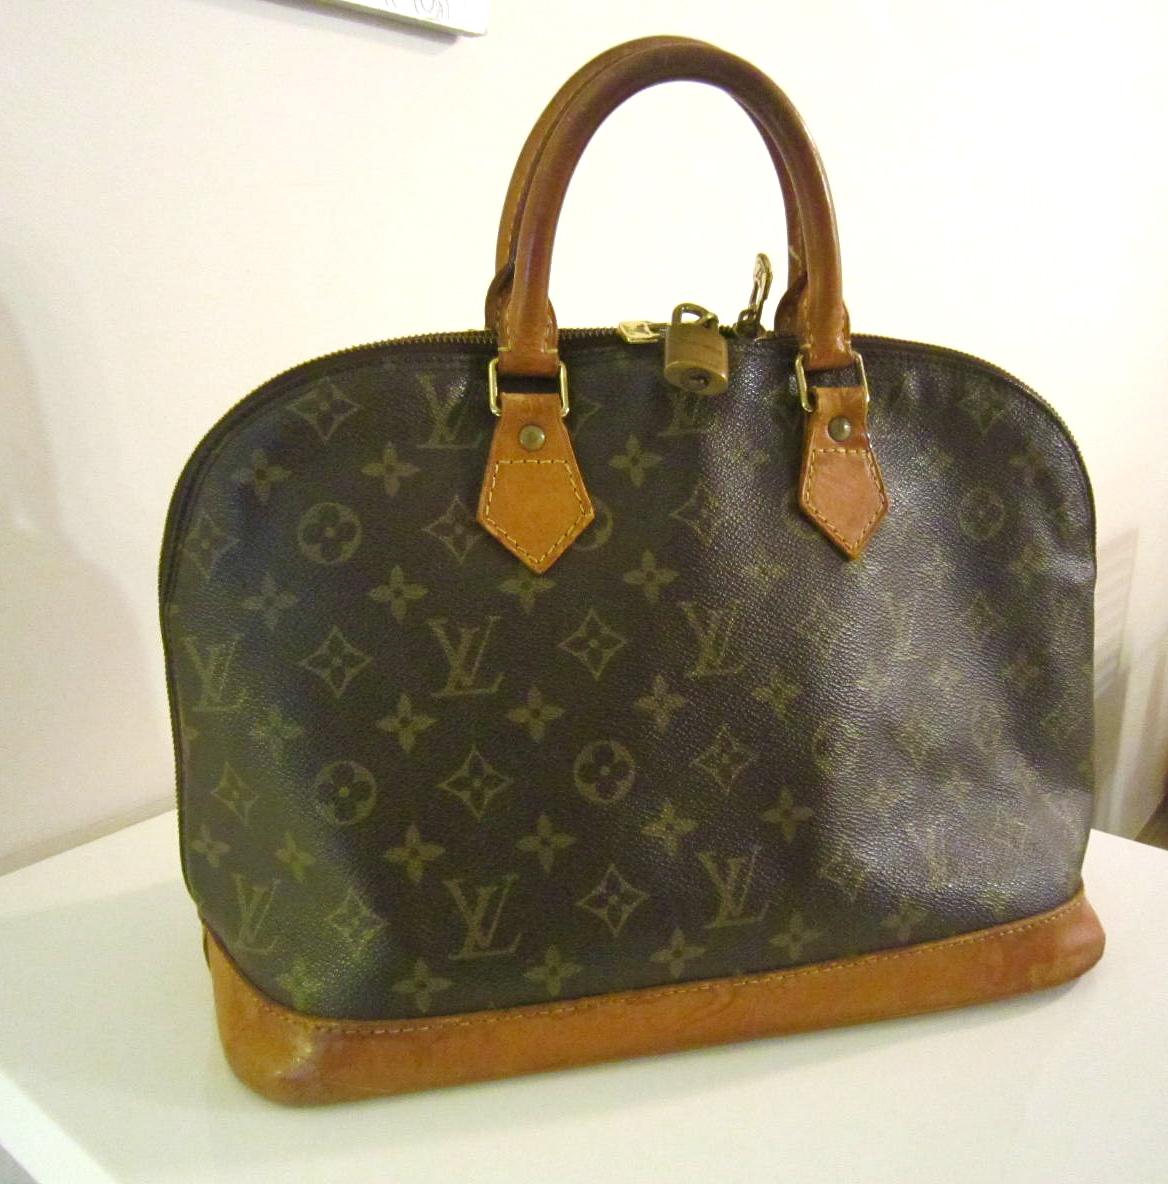 fa8fda35c444 Louis Vuitton Vintage Monogram Alma Handbag - Luxurylana Boutique